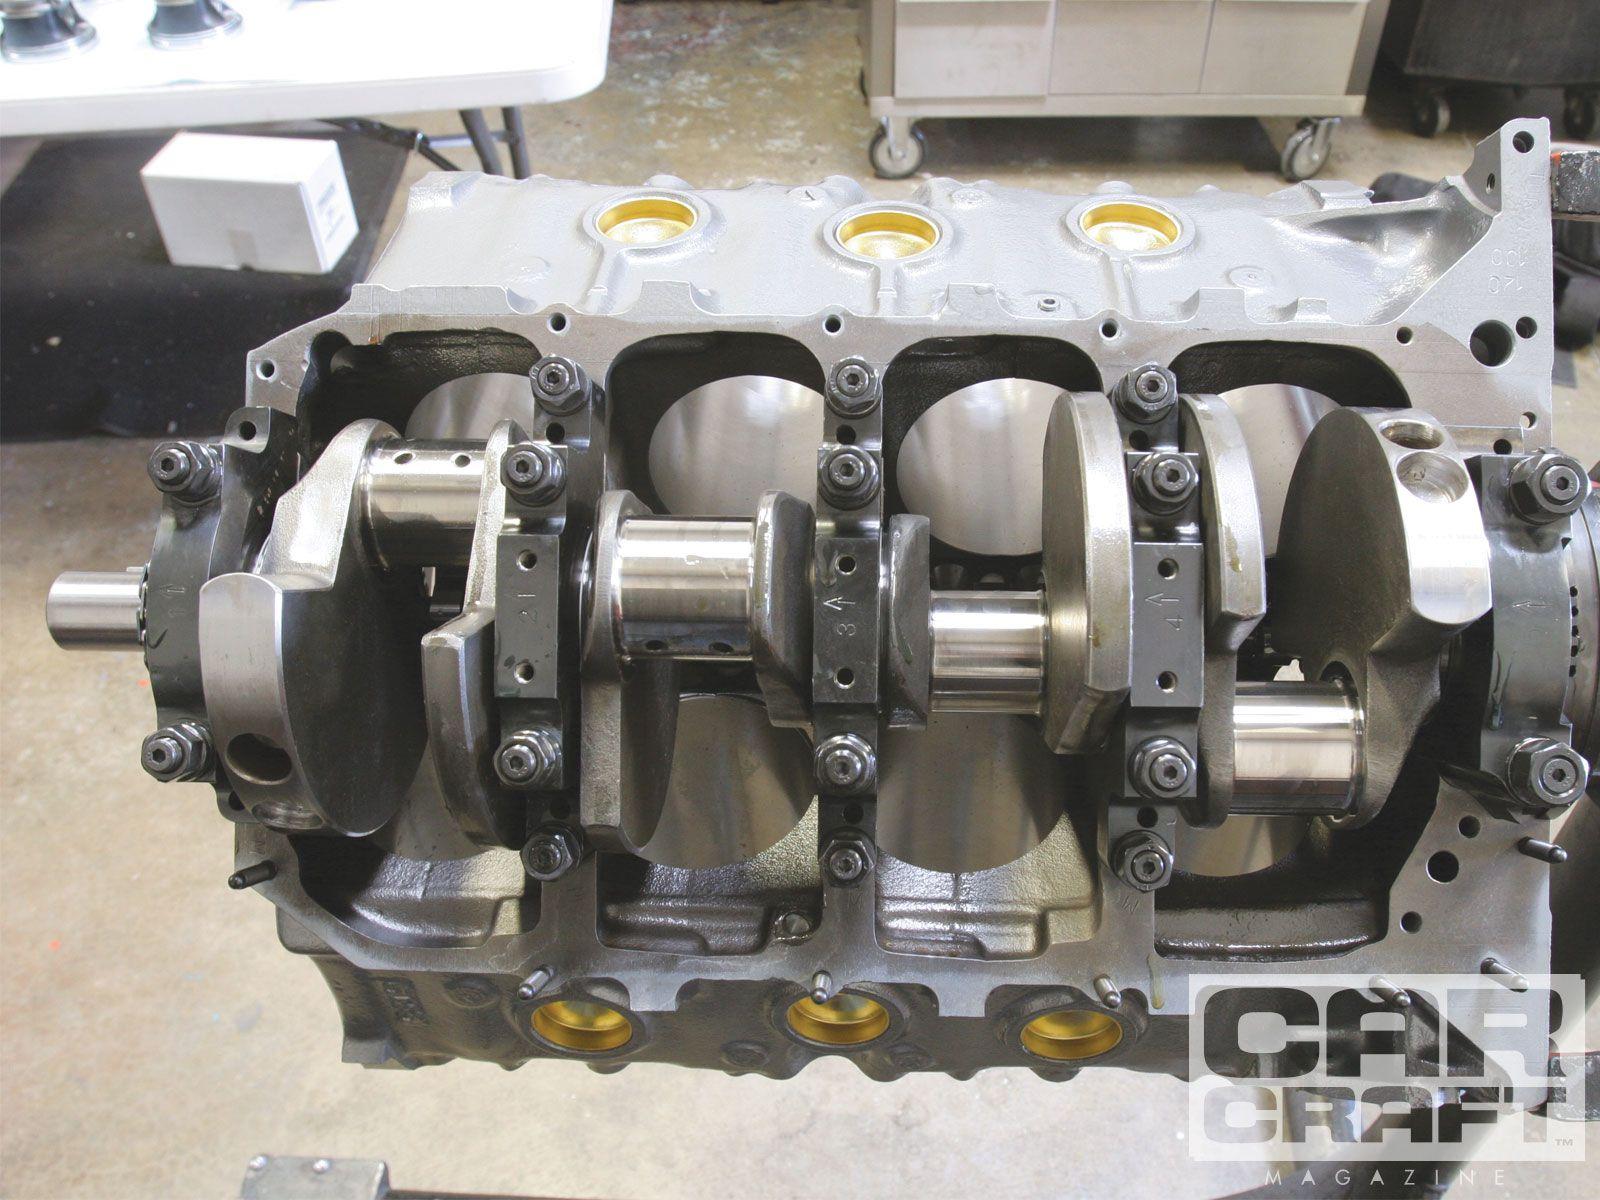 Pontiac 400 Poncho Engine Build - Andy Mitchell Of Hardcore Racing